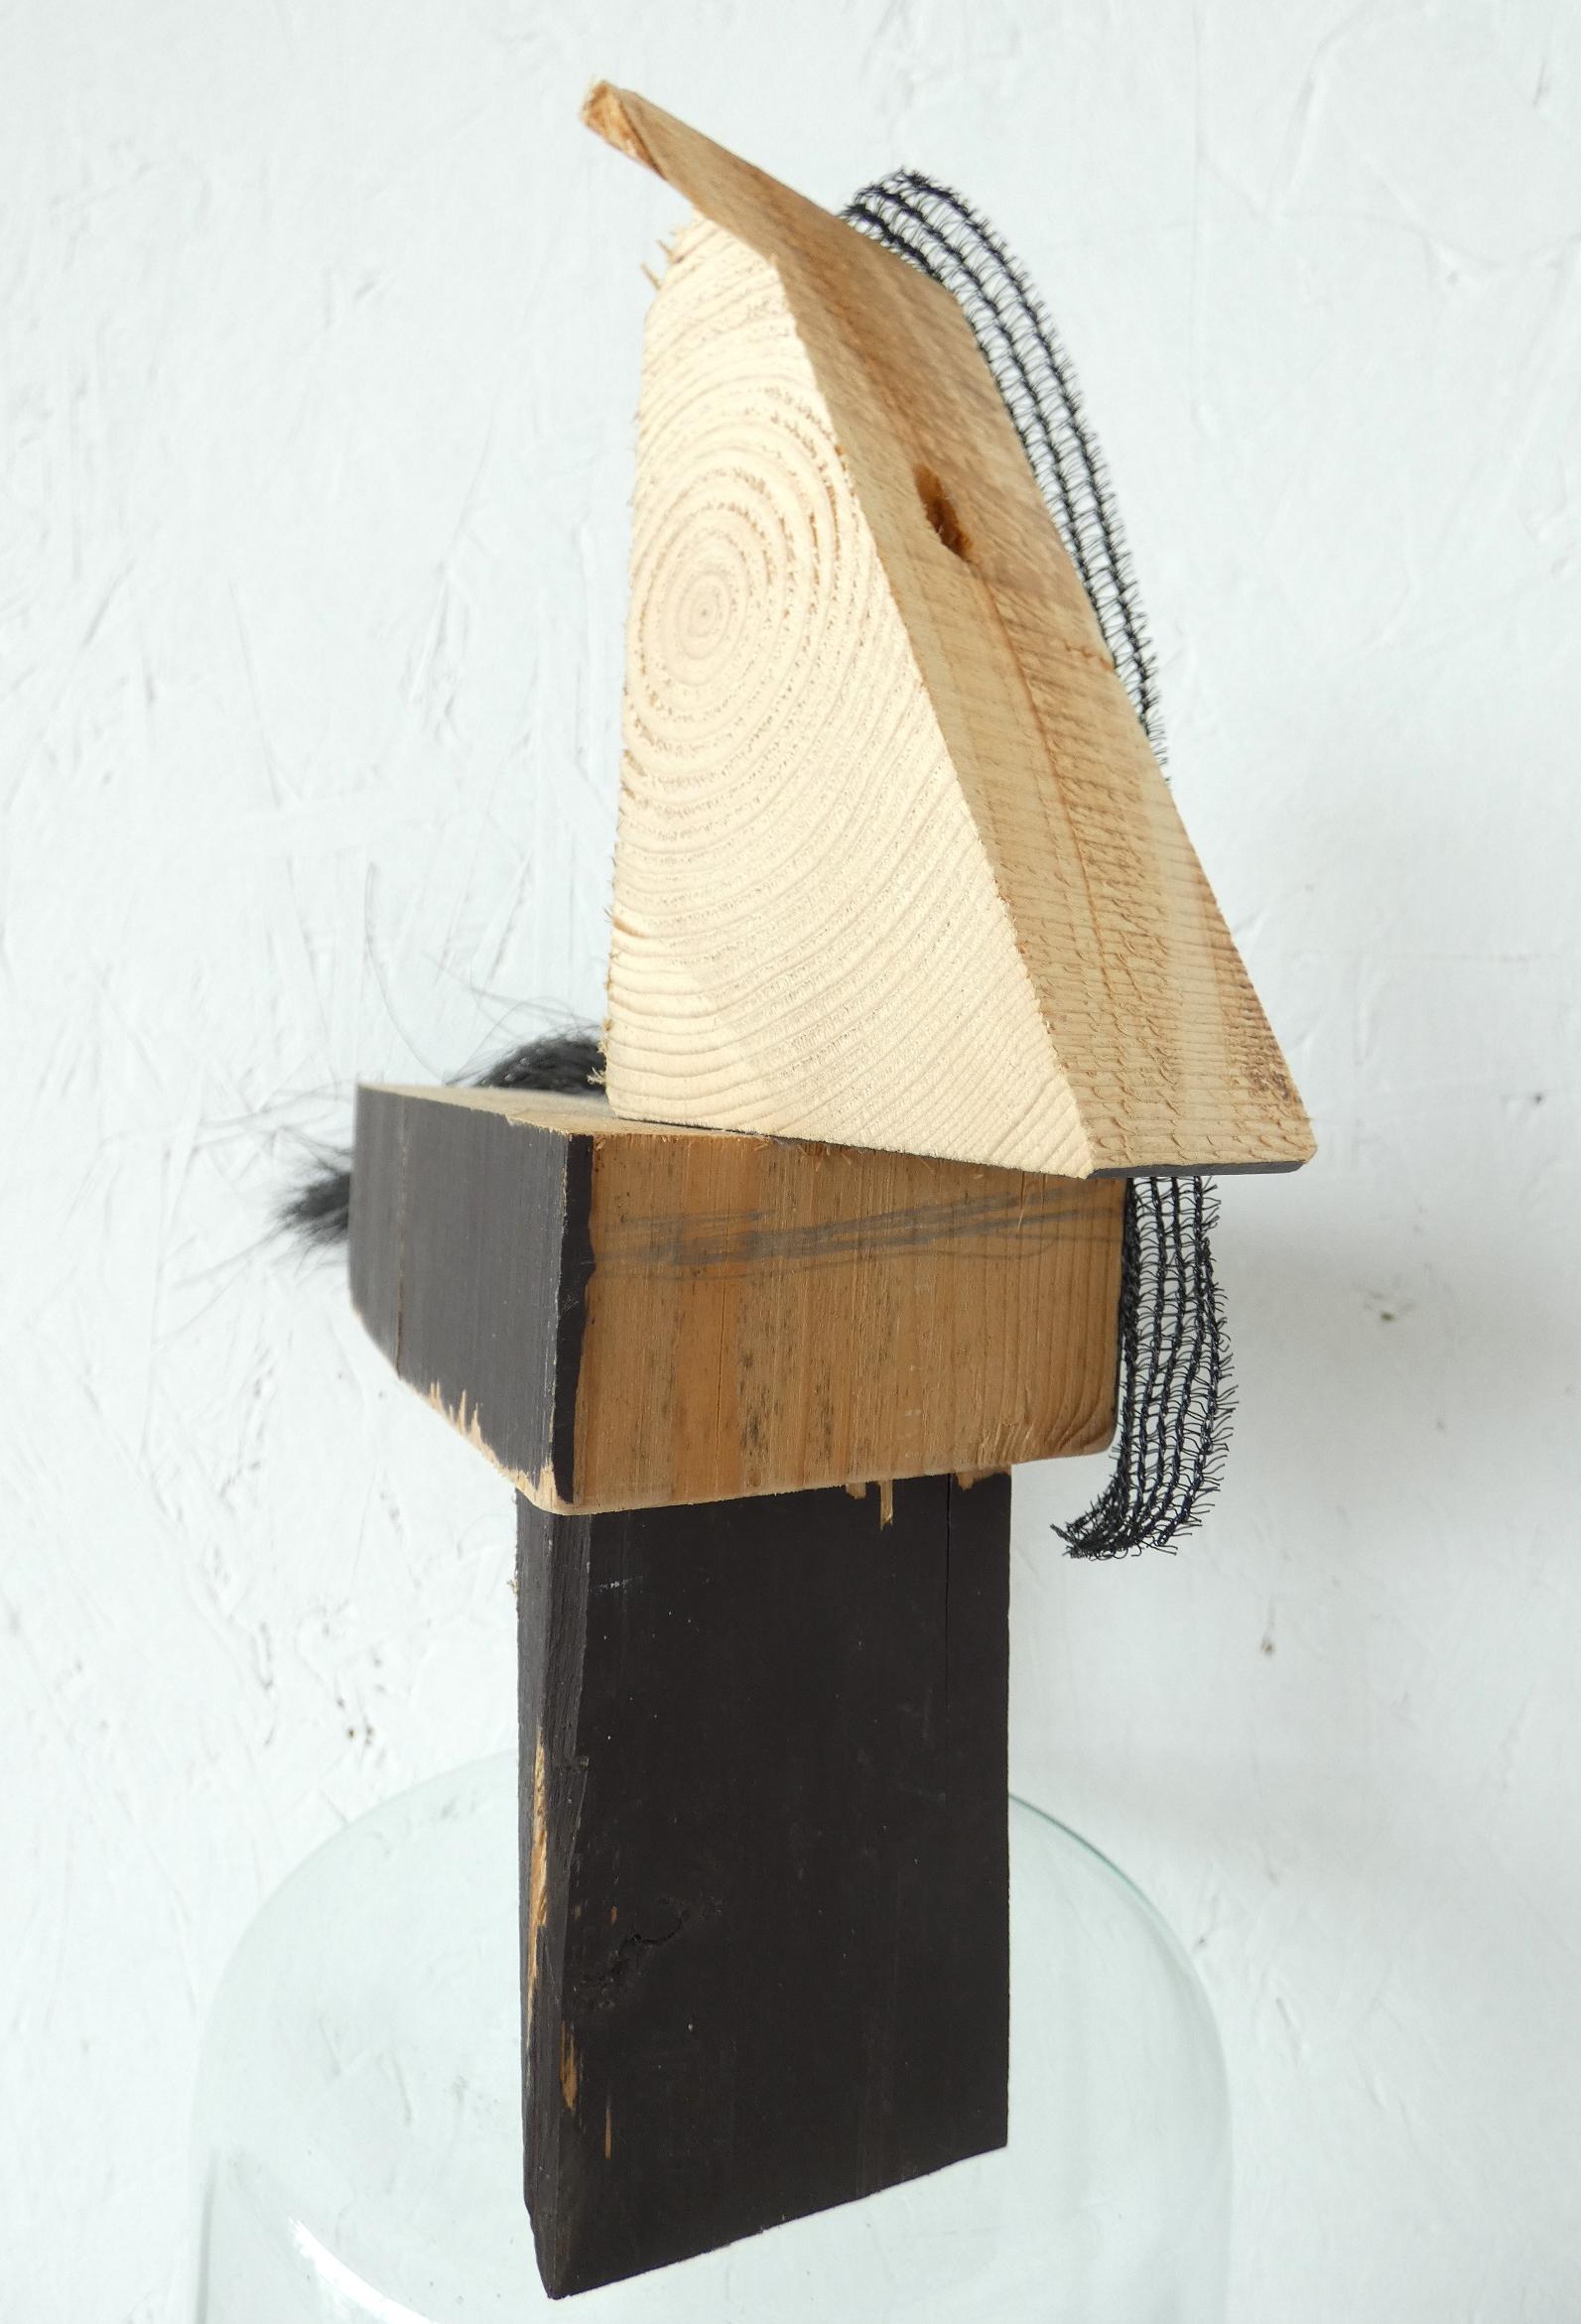 Dressuurpaard object, Dressage horse object, paardenhaar, artwork, artlovers, hout, kunst kopen, artcollectors, sculpture, kunstenaar Wietske Lycklama à Nijeholt